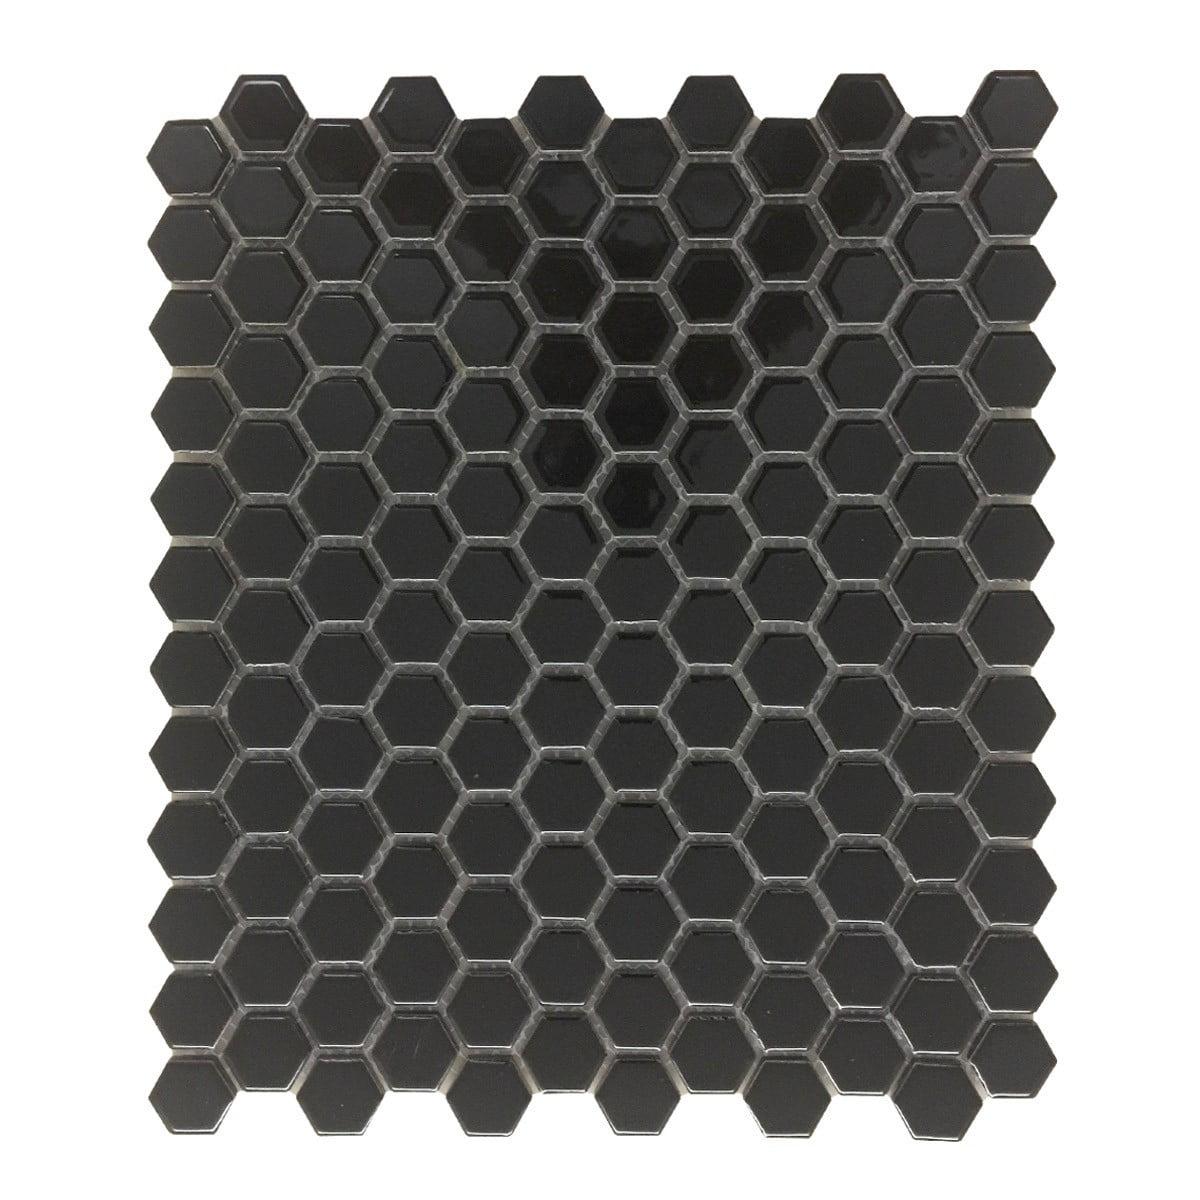 "Black Glossy Porcelain Mosaic Hexagon Floor Wall Tile 1 Sheet 10.25"" x 11.8"""